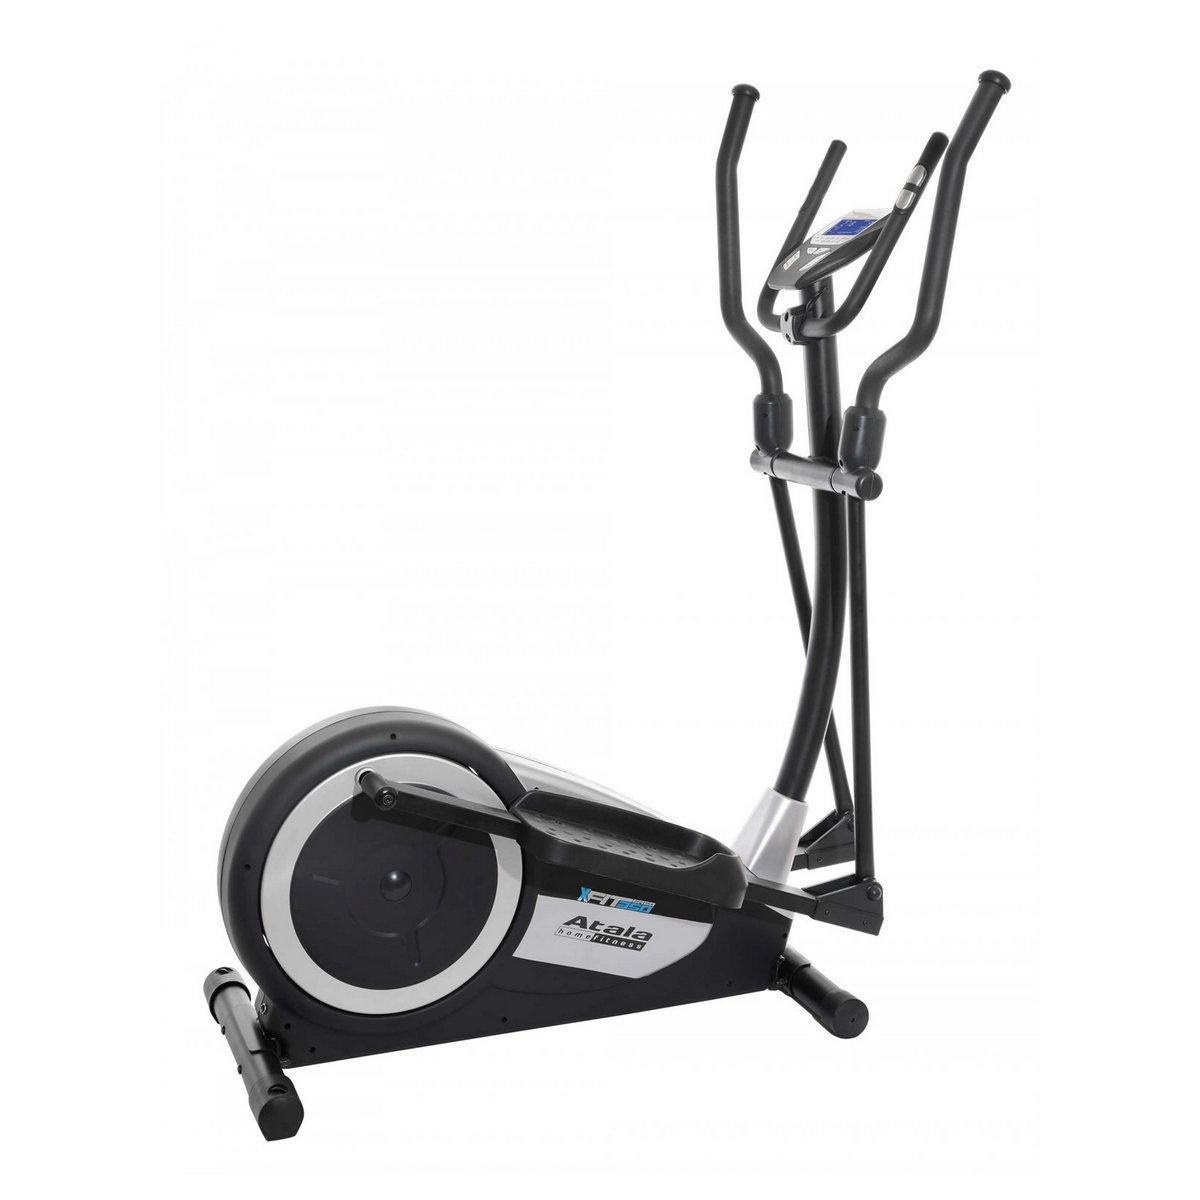 Elliptical trainer XFIT 350 V1